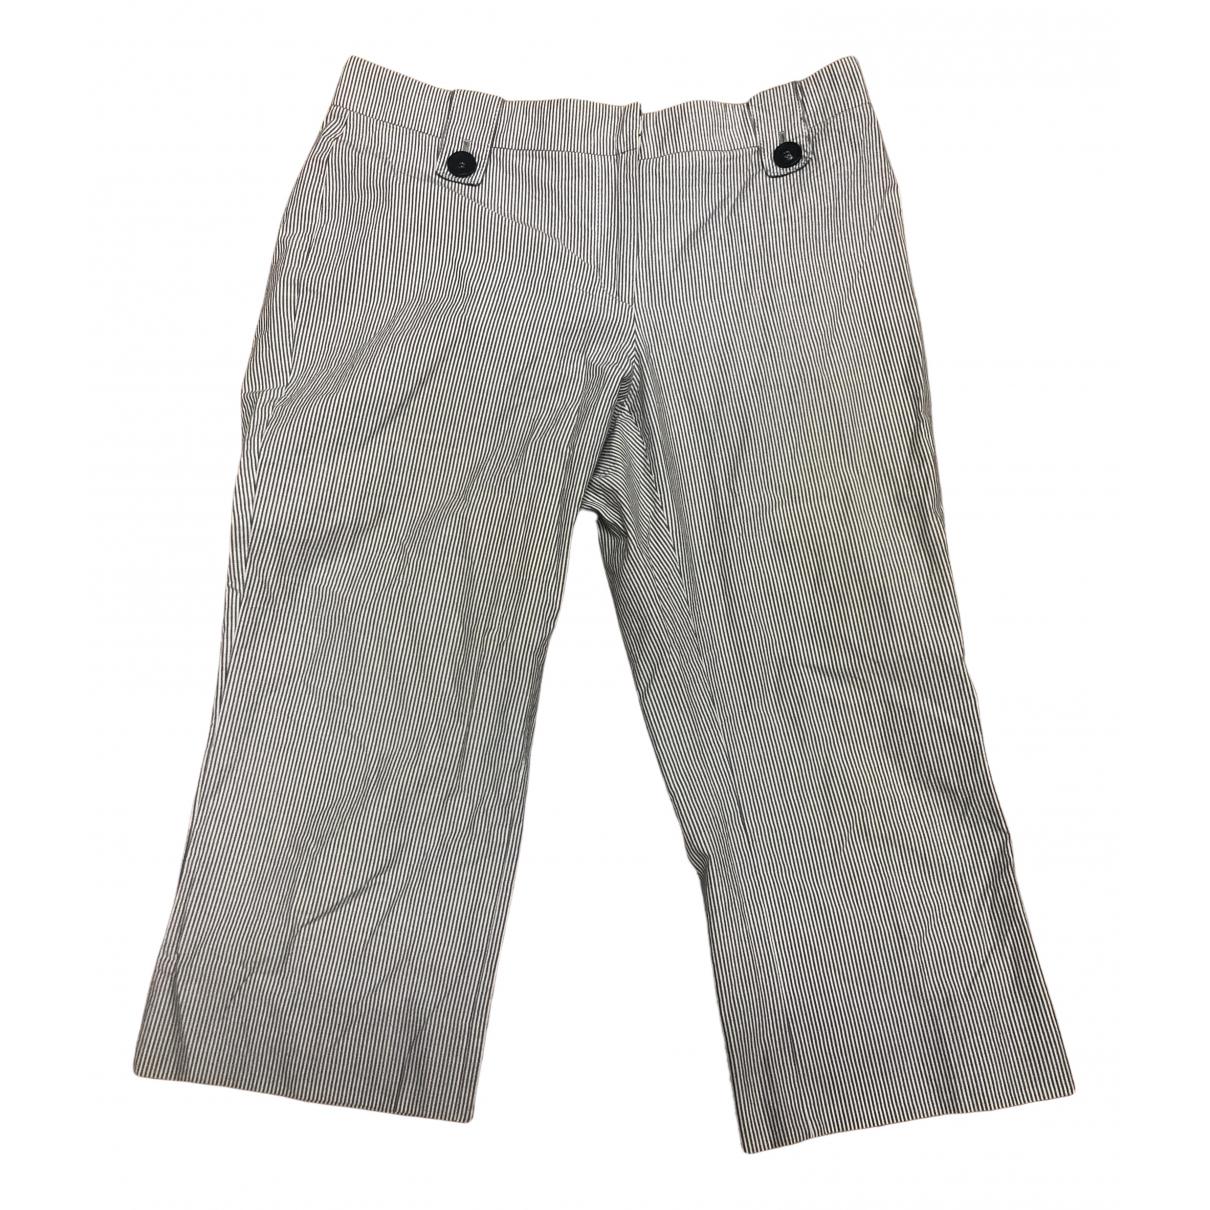 Burberry \N White Cotton Shorts for Women 10 UK